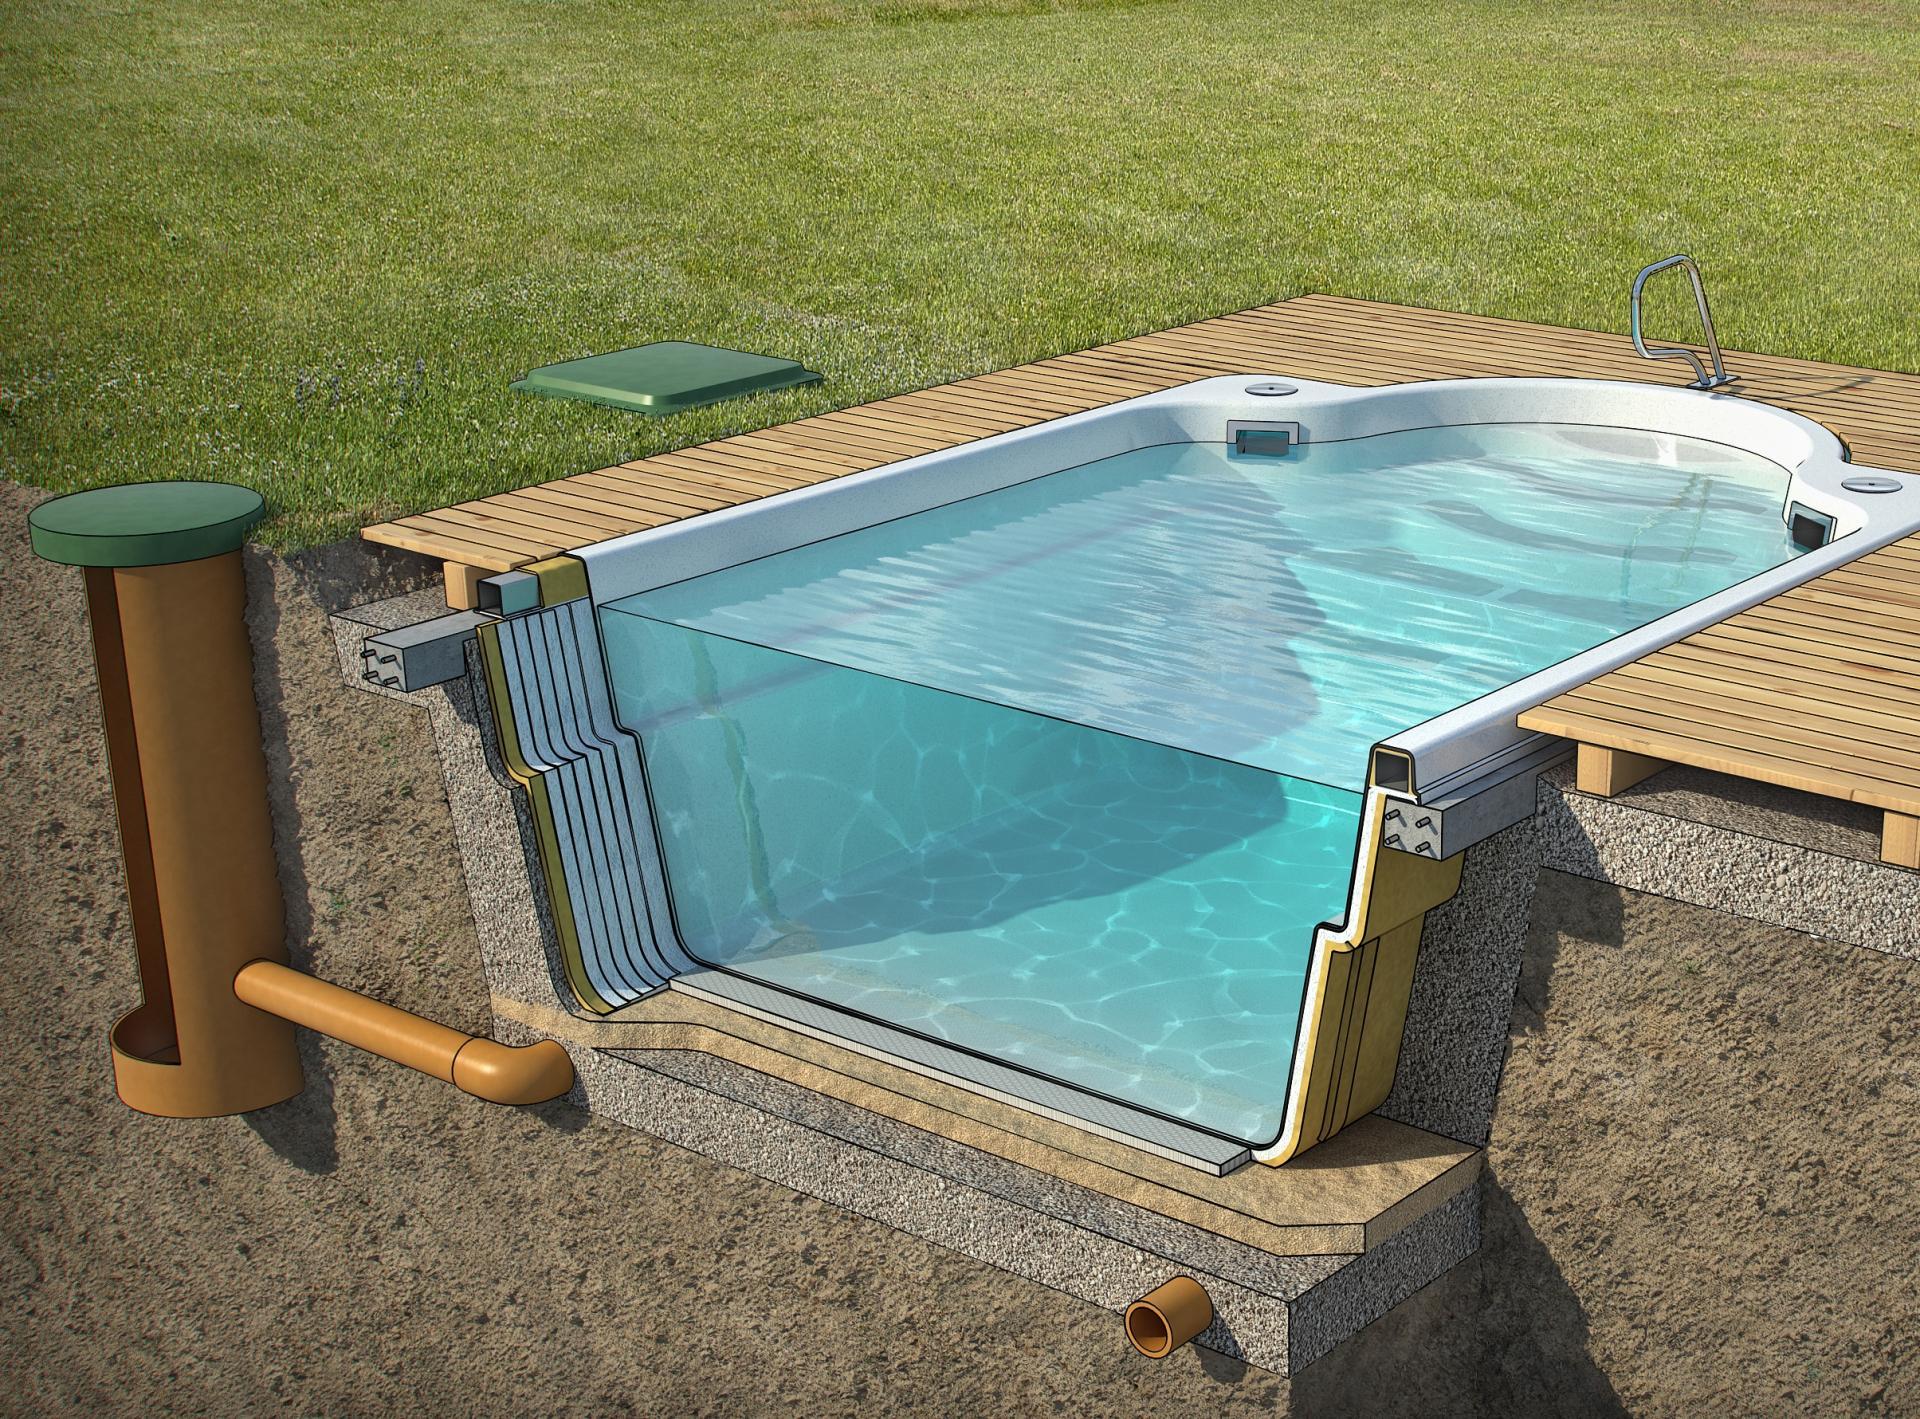 Установка бассейна из пластика